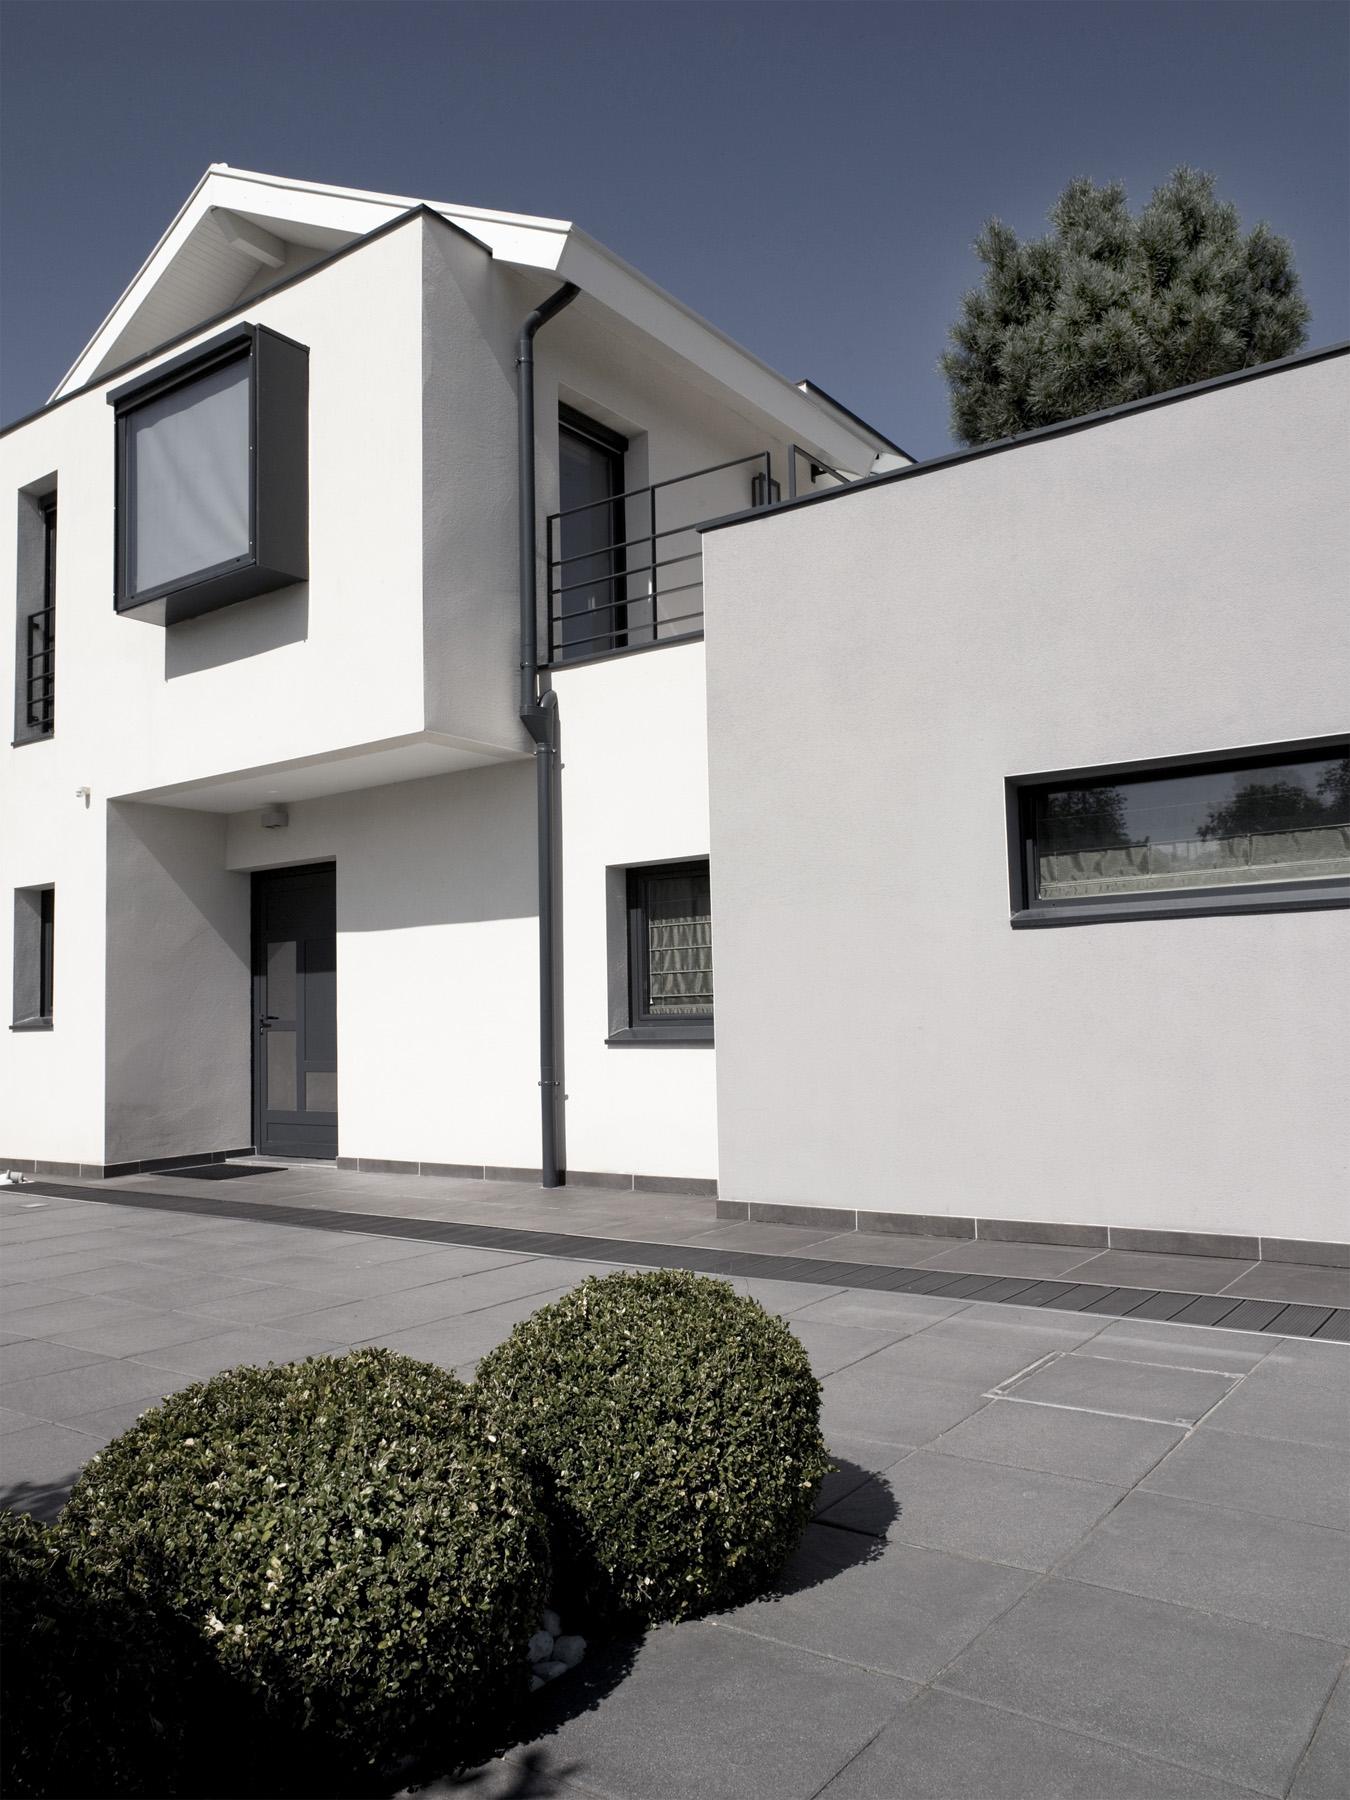 Janik architecte maison individuelle st jean en moirans 1 for Architecte maison individuelle